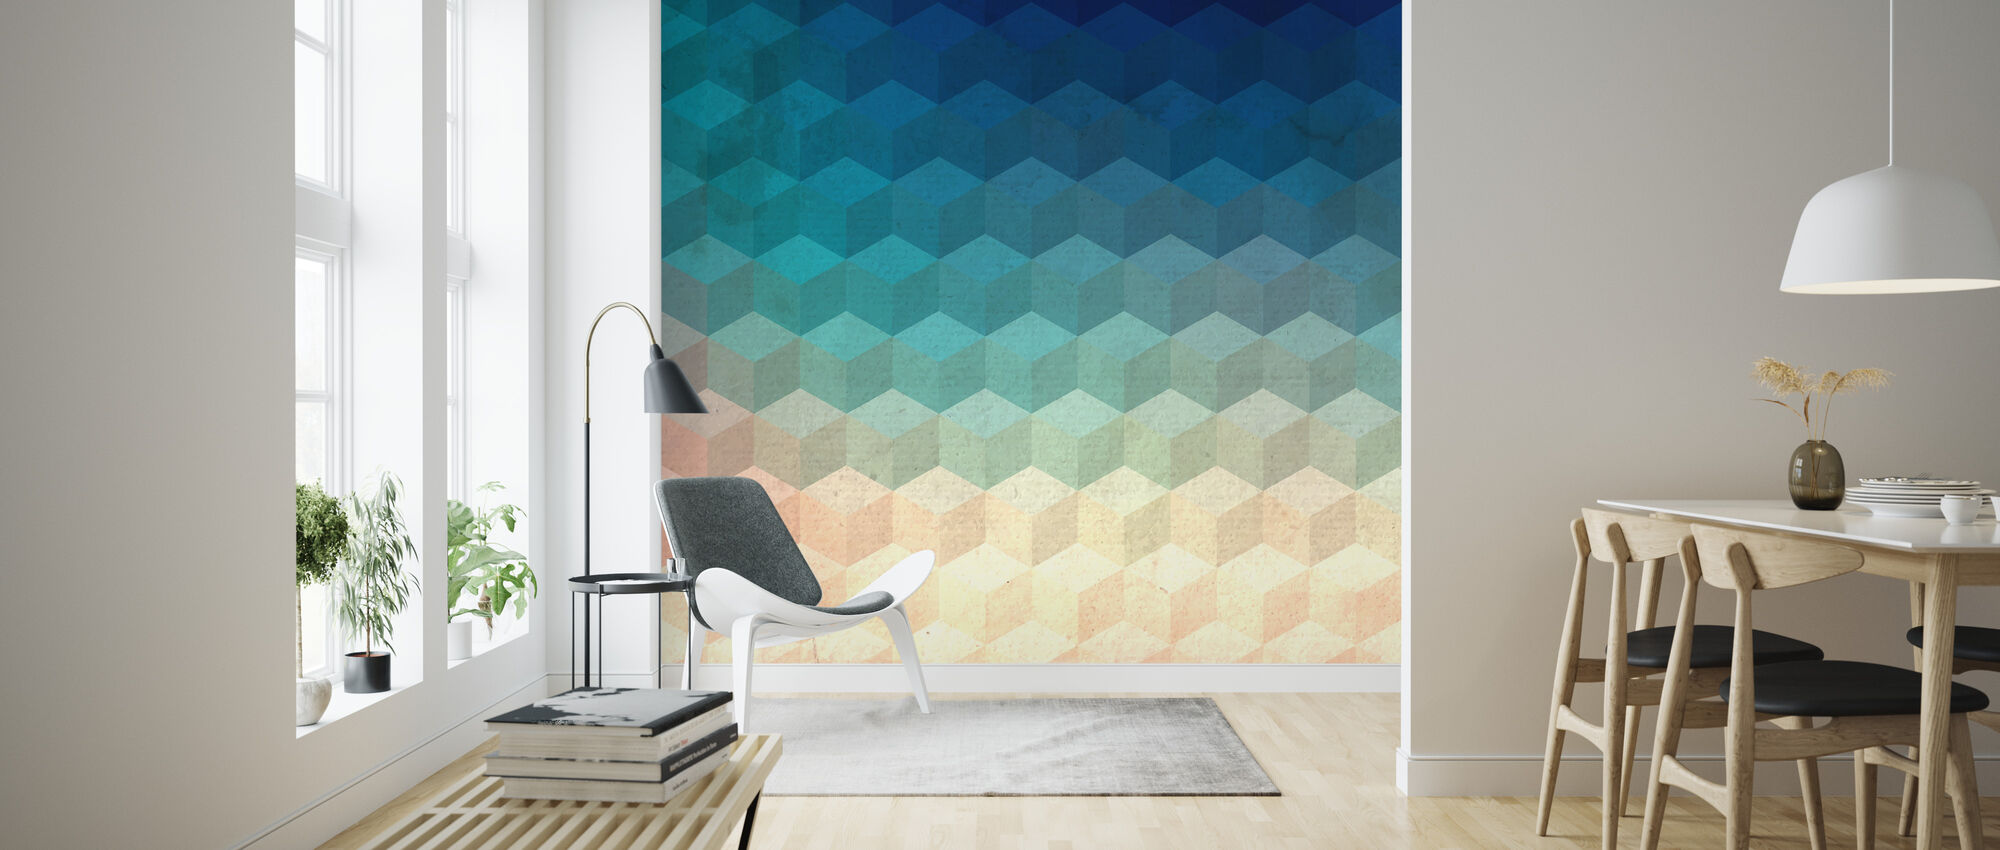 Cubos hexagonales - Papel pintado - Salón